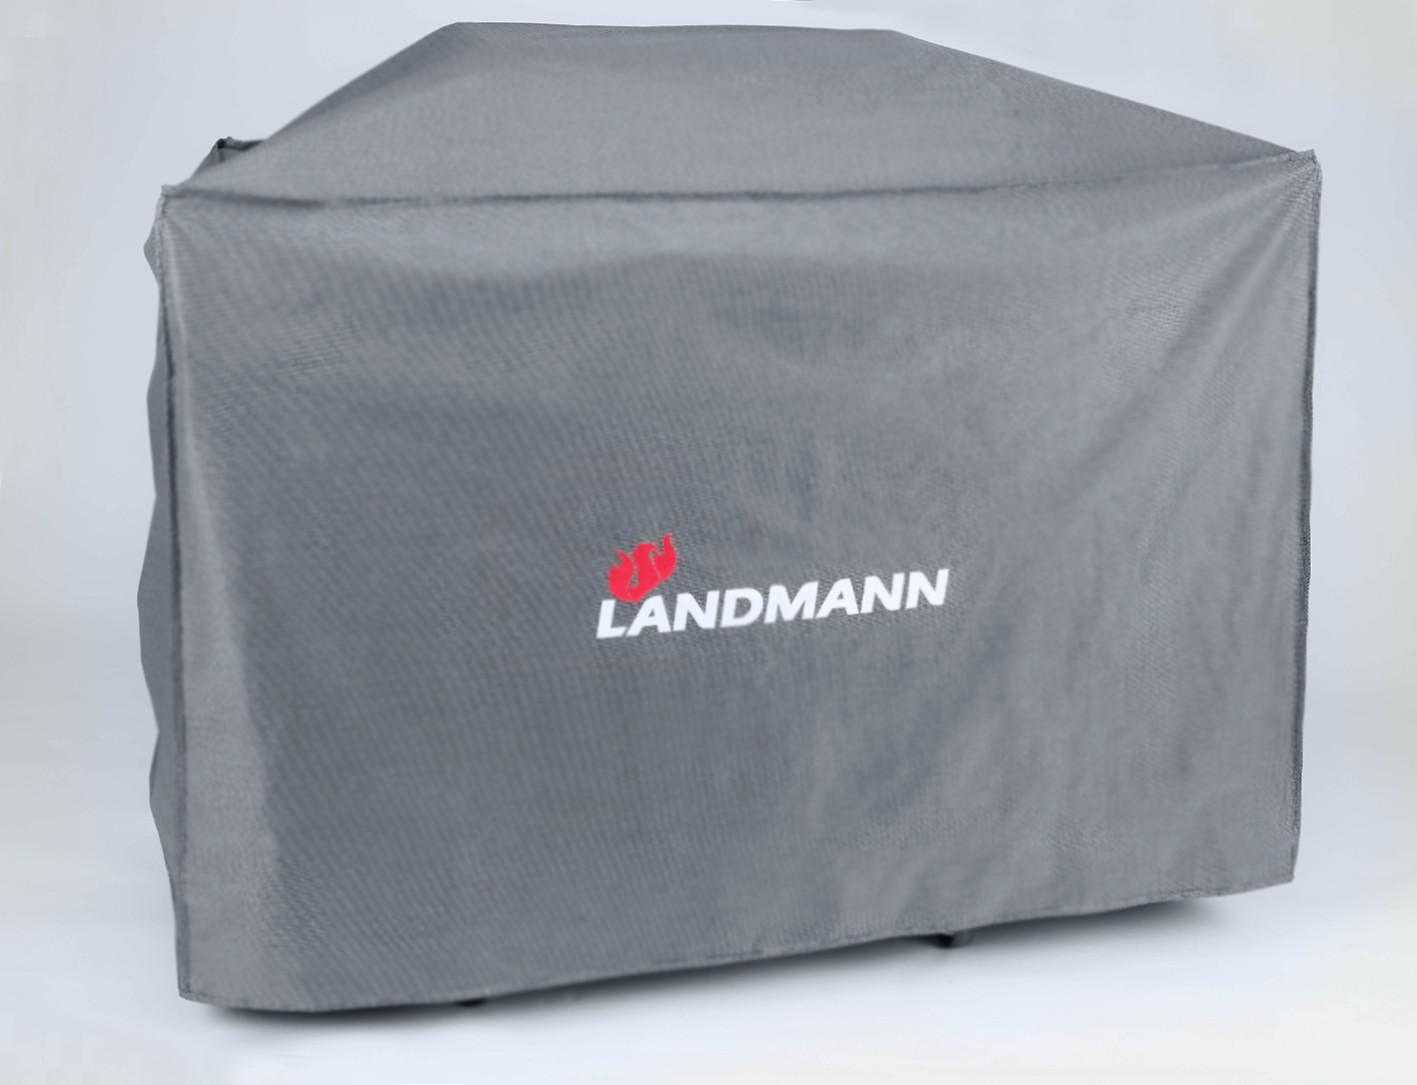 Landmann Gasgrill Forum : Landmann gasgrillwagen triton 4 silber